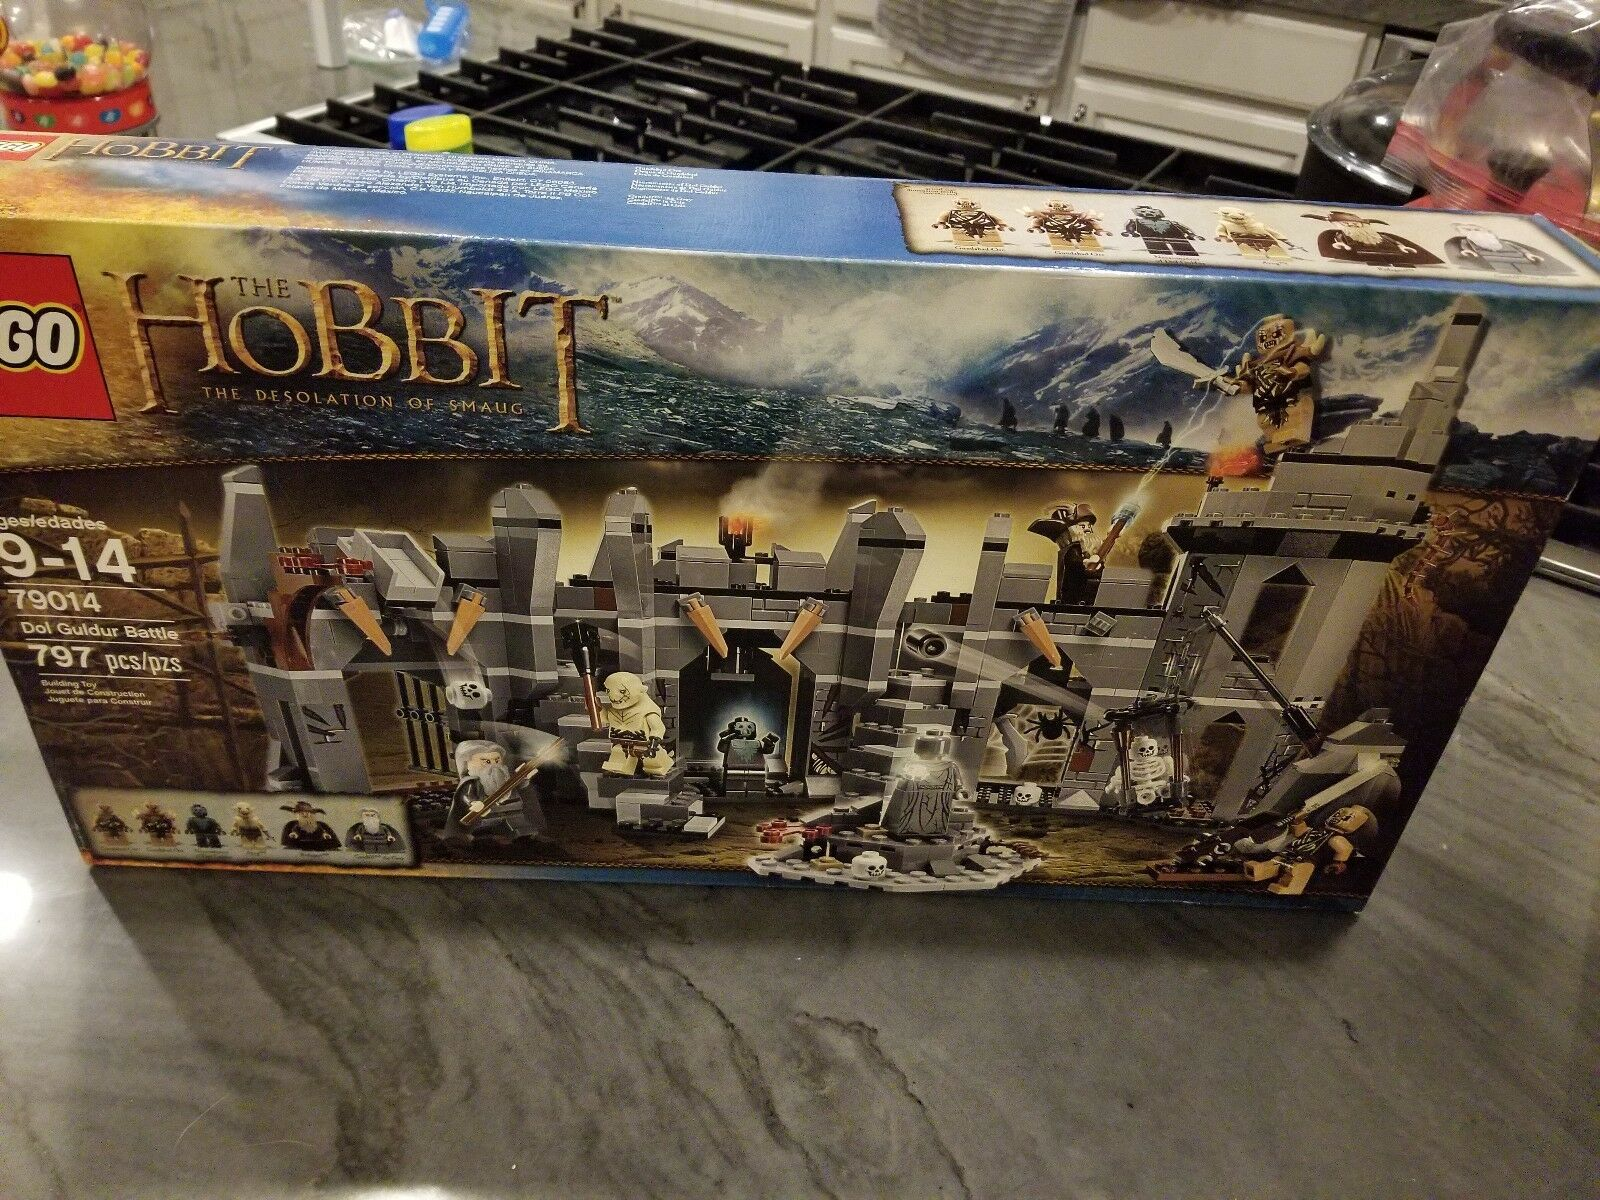 LEGO 79014 The Hobbit 79014 Dol Guldur Battle NISB Perfect Box No Reserve